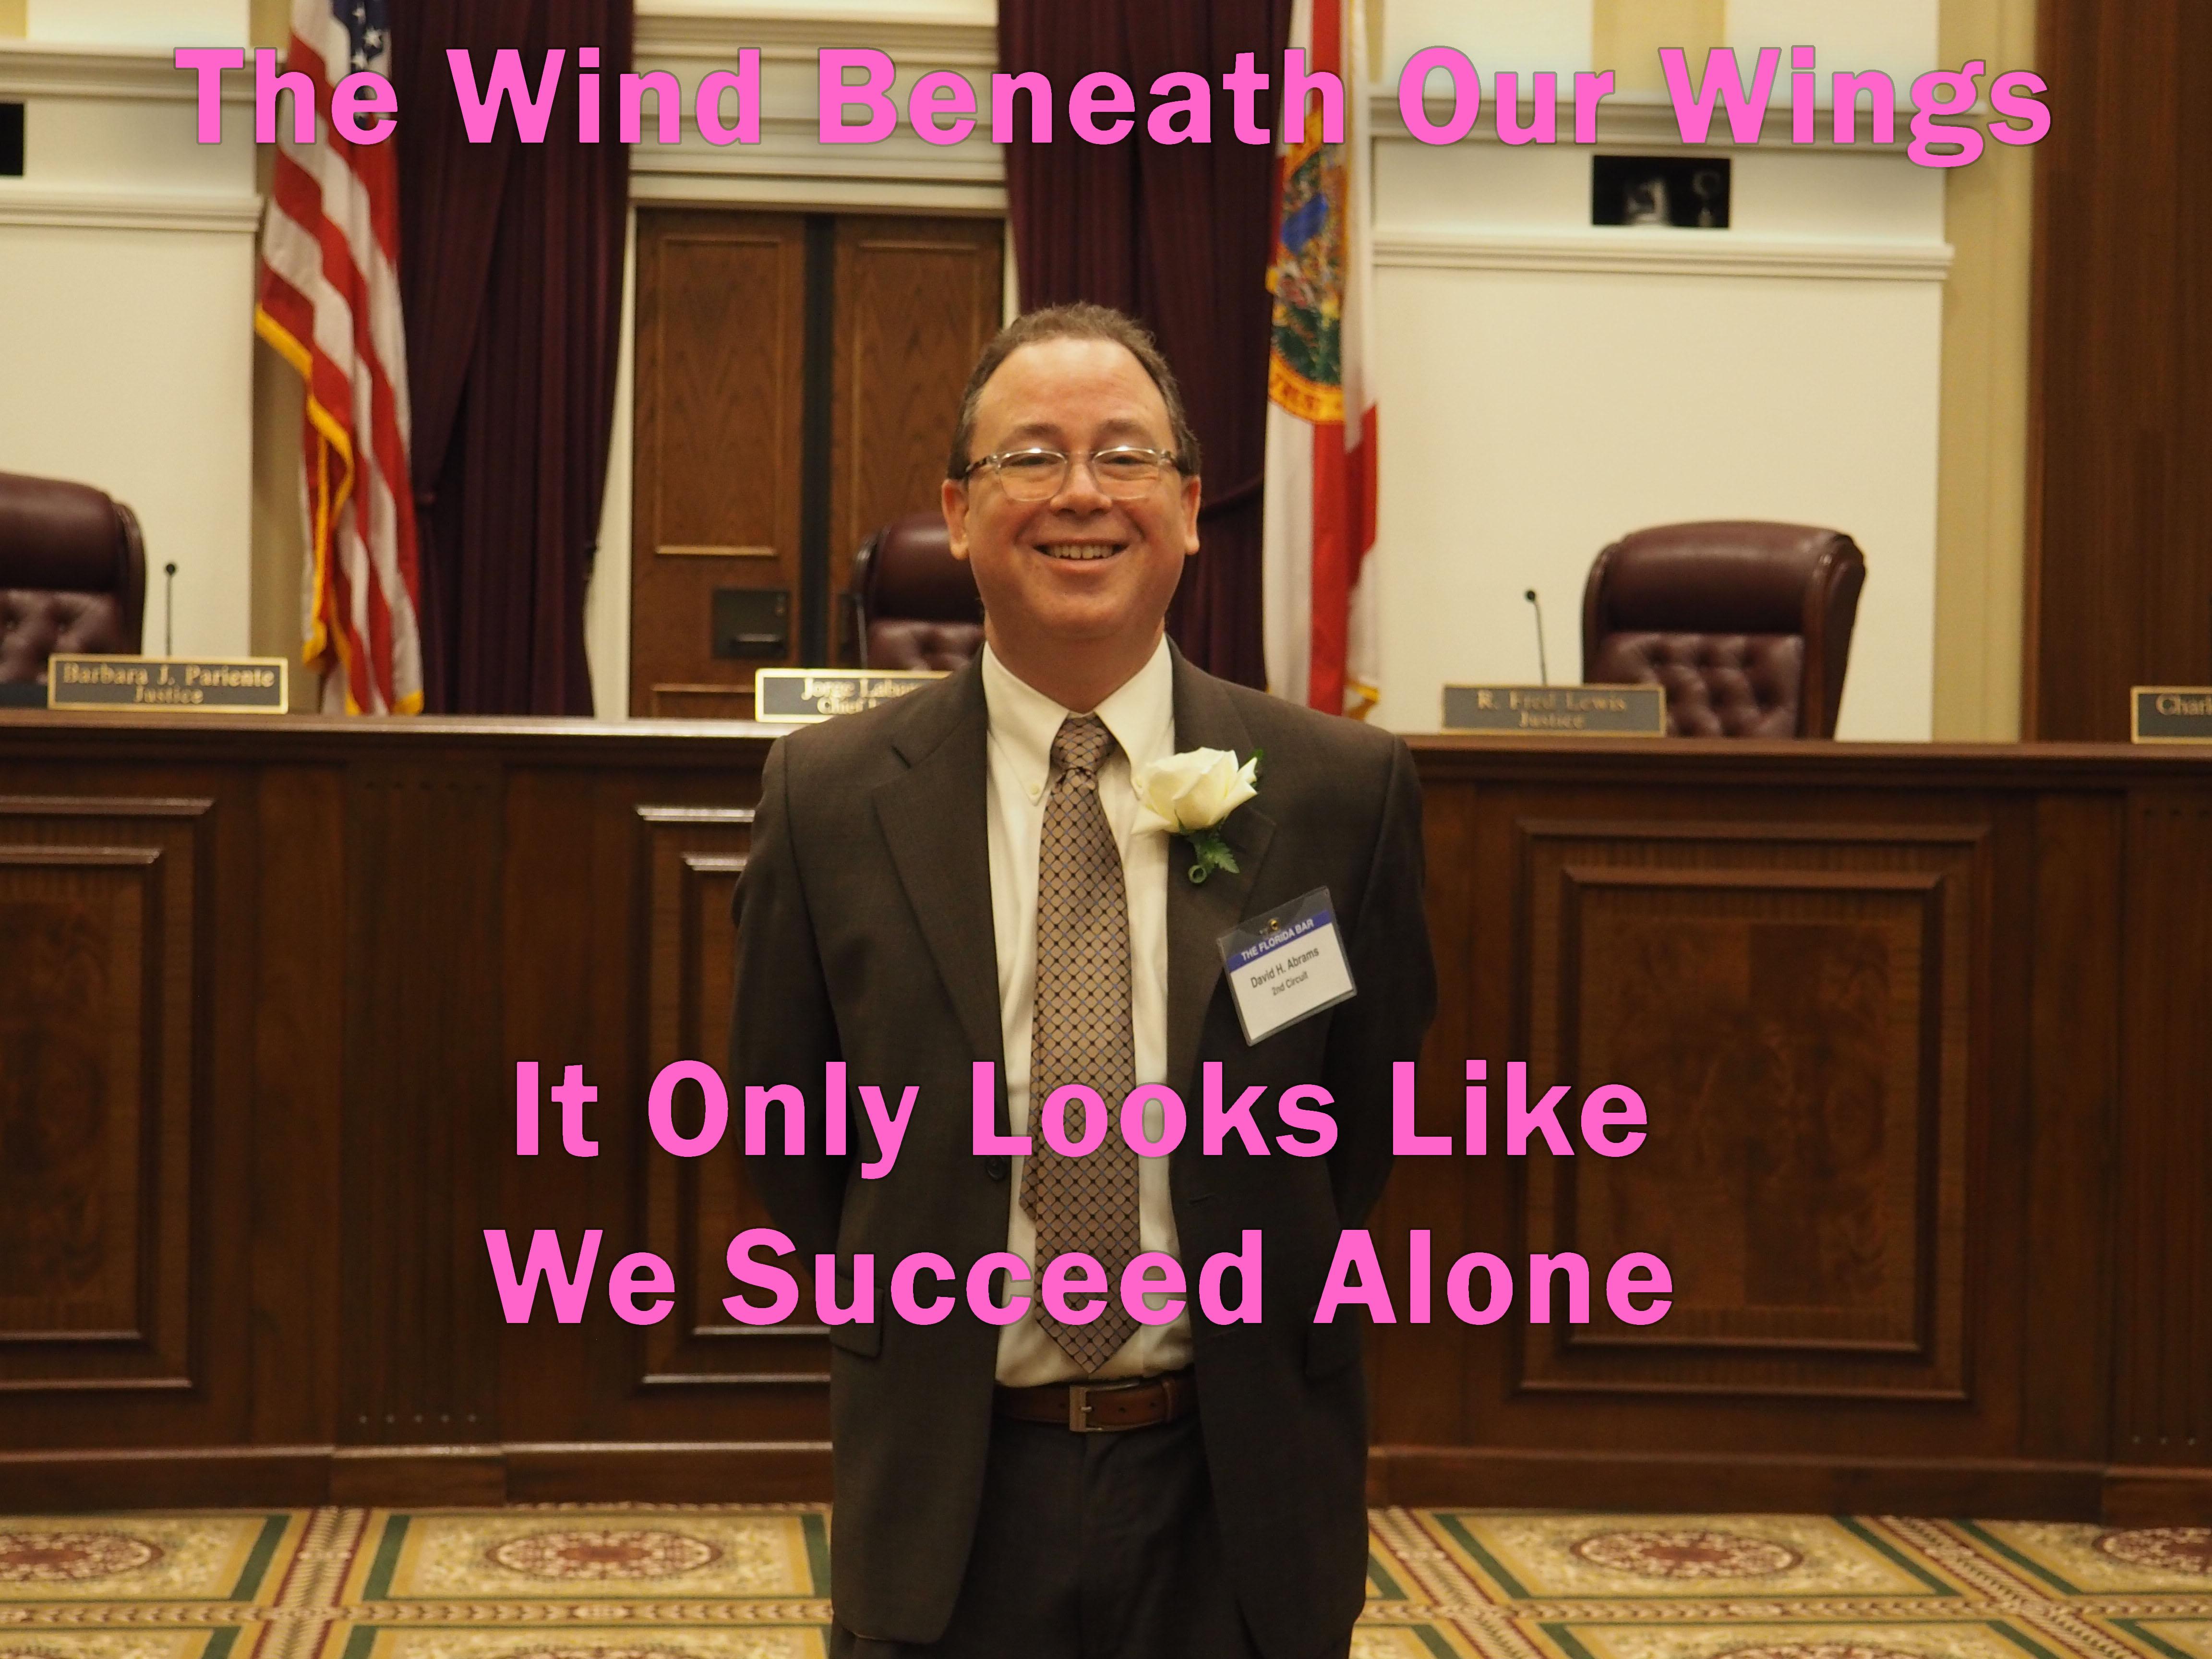 The Wind Beneath My Wings At the Florida Bar President's Pro Bono Award